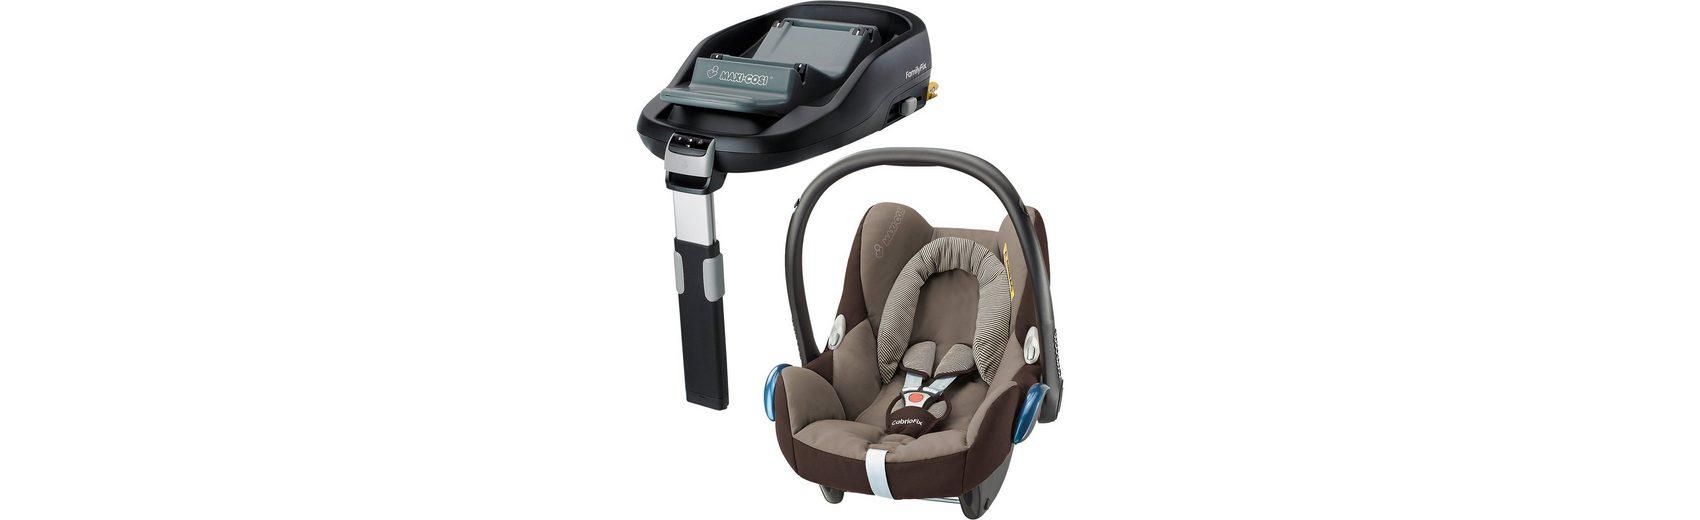 Maxi-Cosi Babyschale Cabriofix, earth brown, inkl. FamilyFix